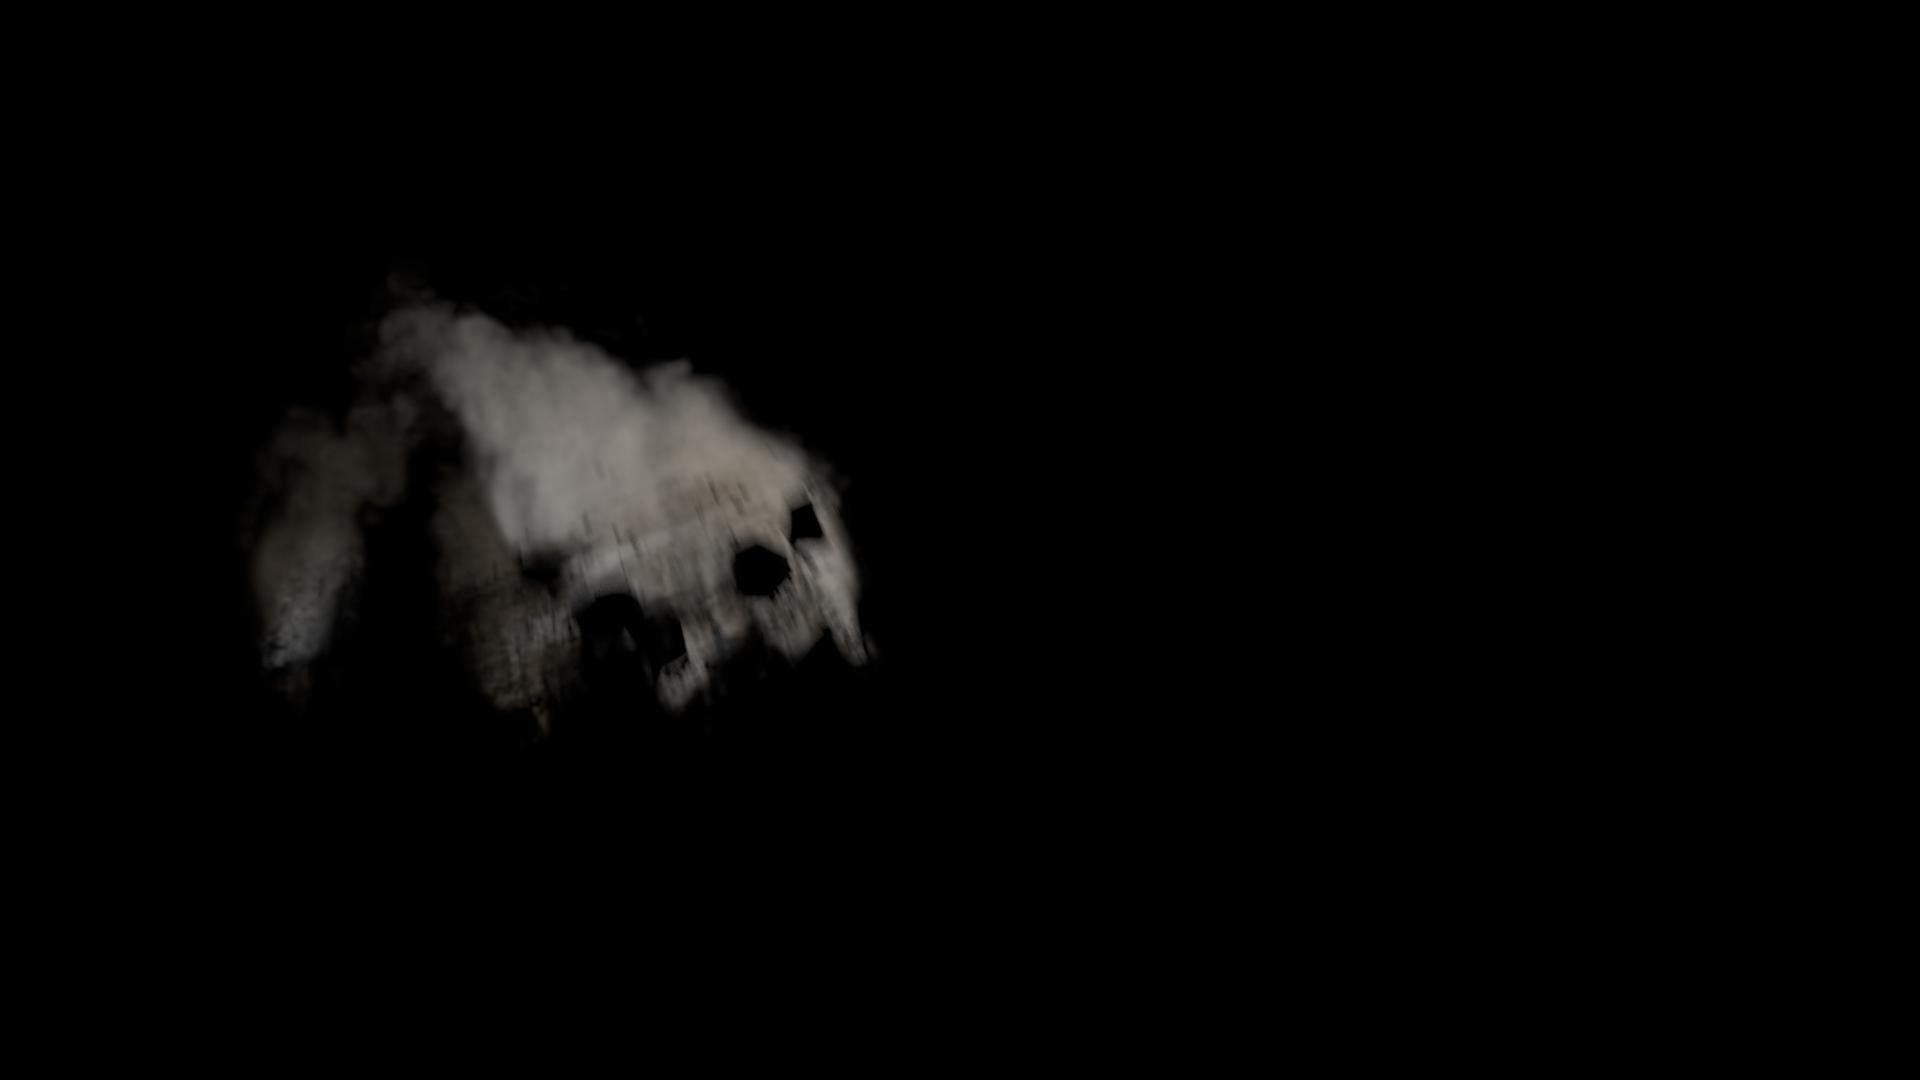 fluid_03.1039.png